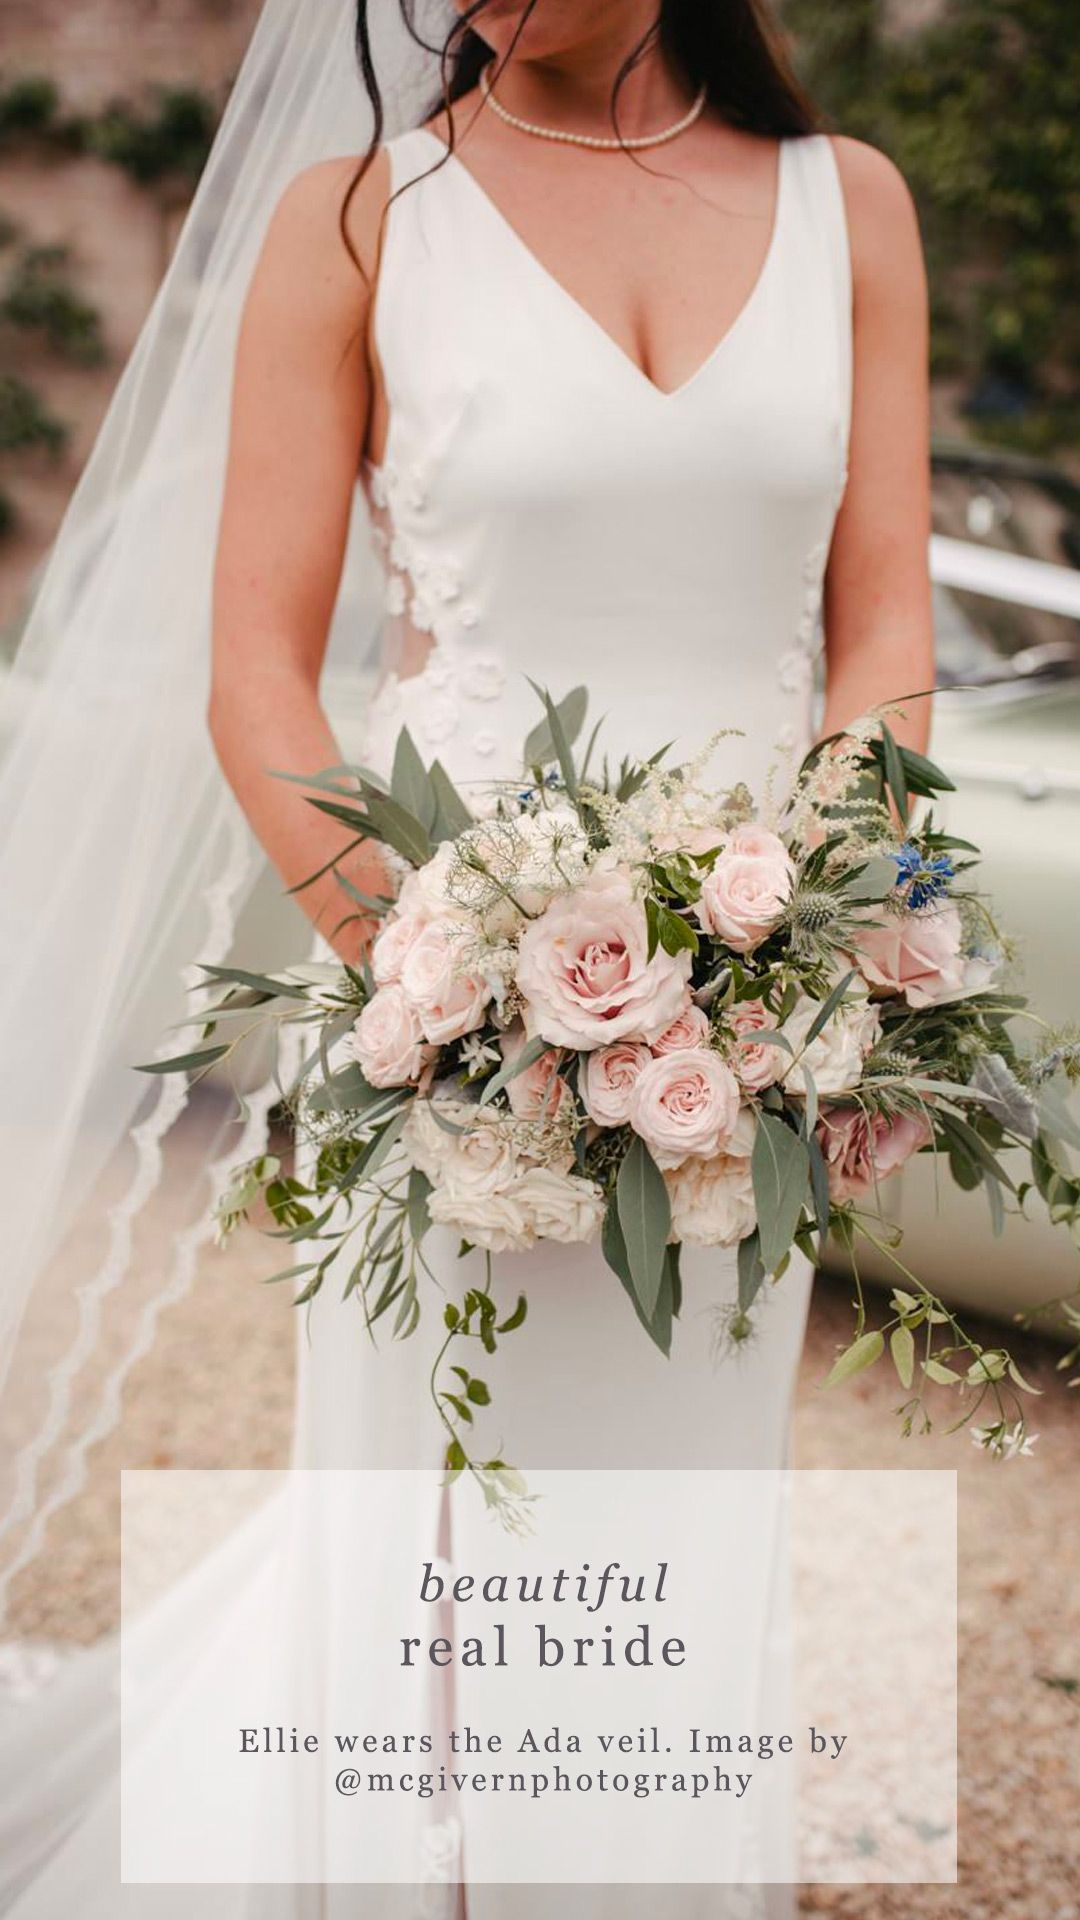 Full lace edged single tier wedding veil - 'Ada'